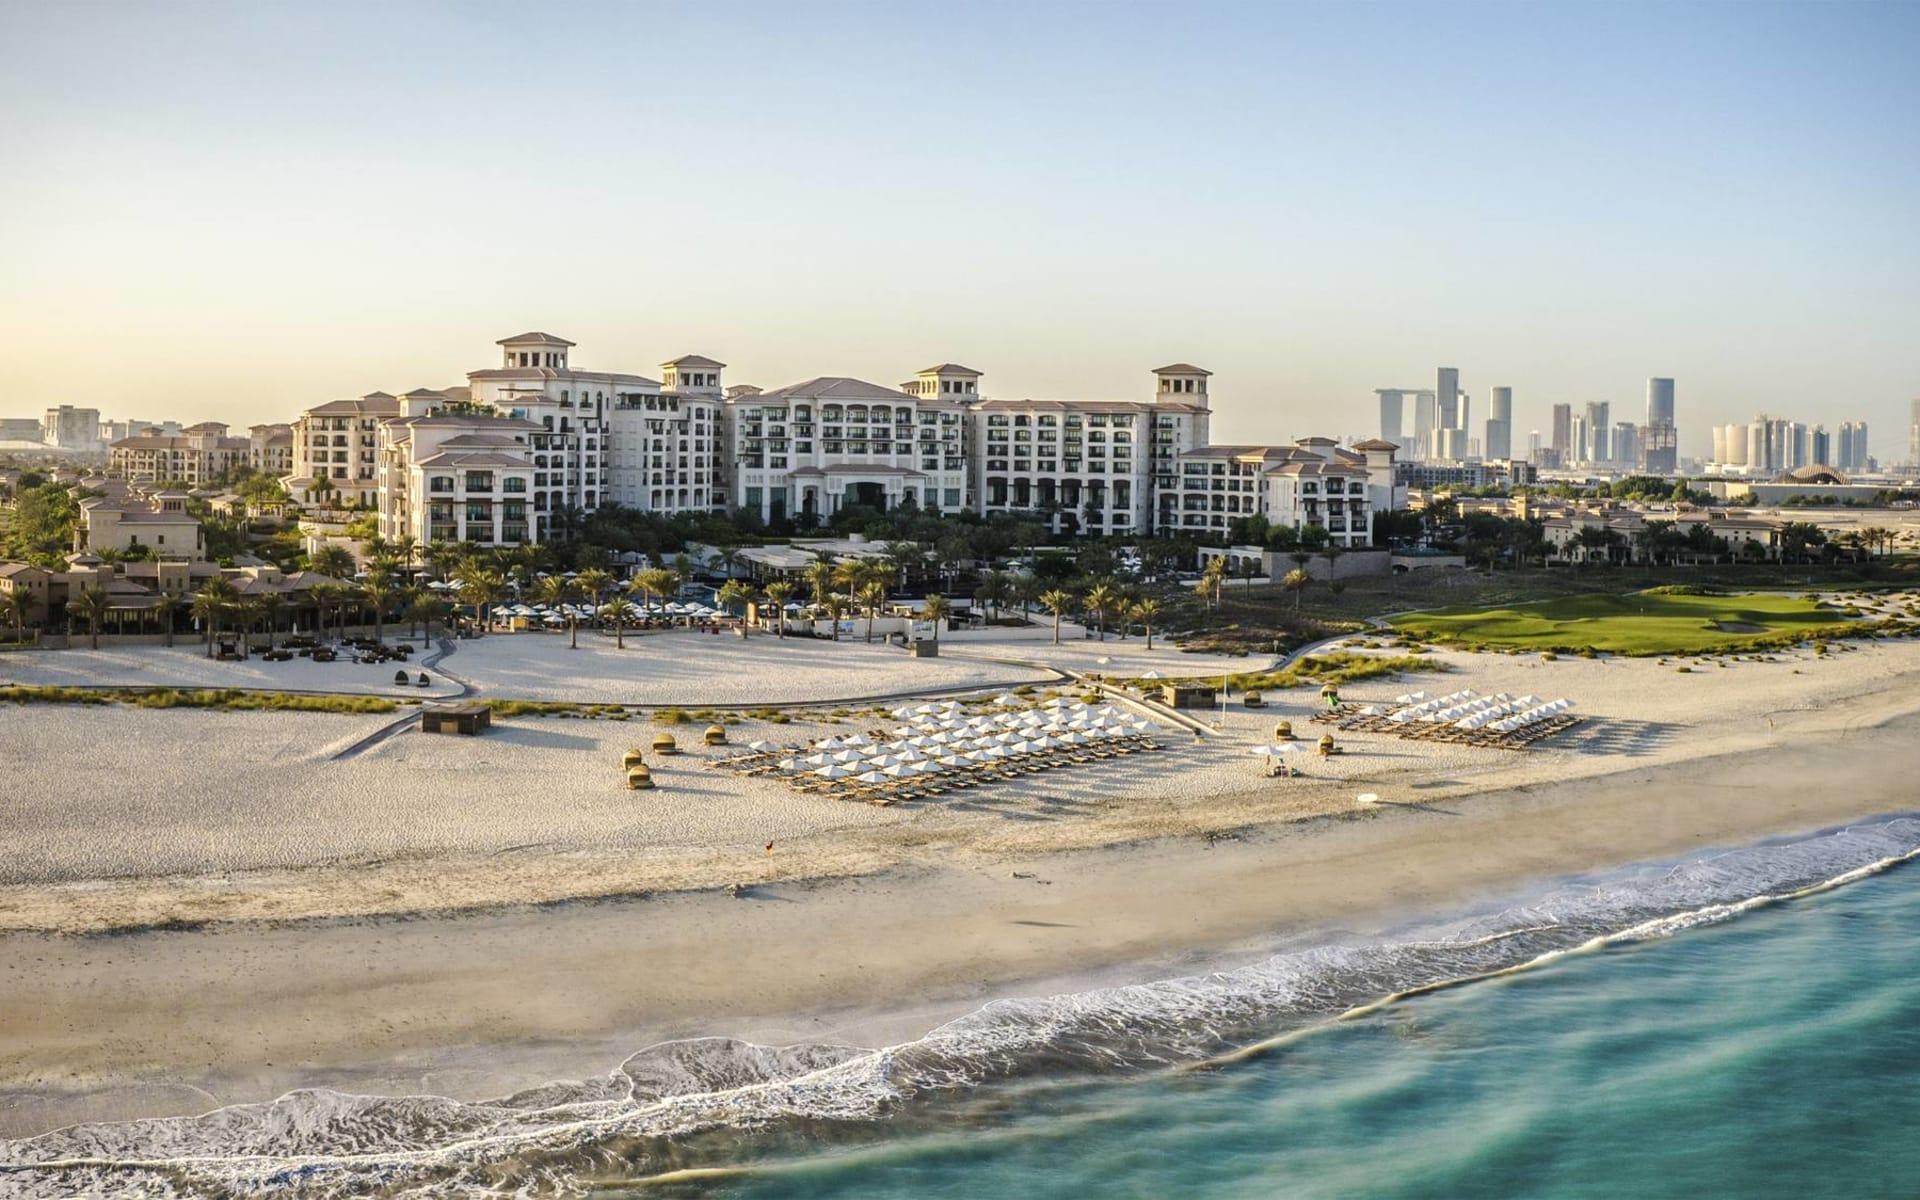 St. Regis Saadiyat Island Resort Abu Dhabi: St. Regis Saadiyat Island Resort Abu Dhabi - Aussenansicht